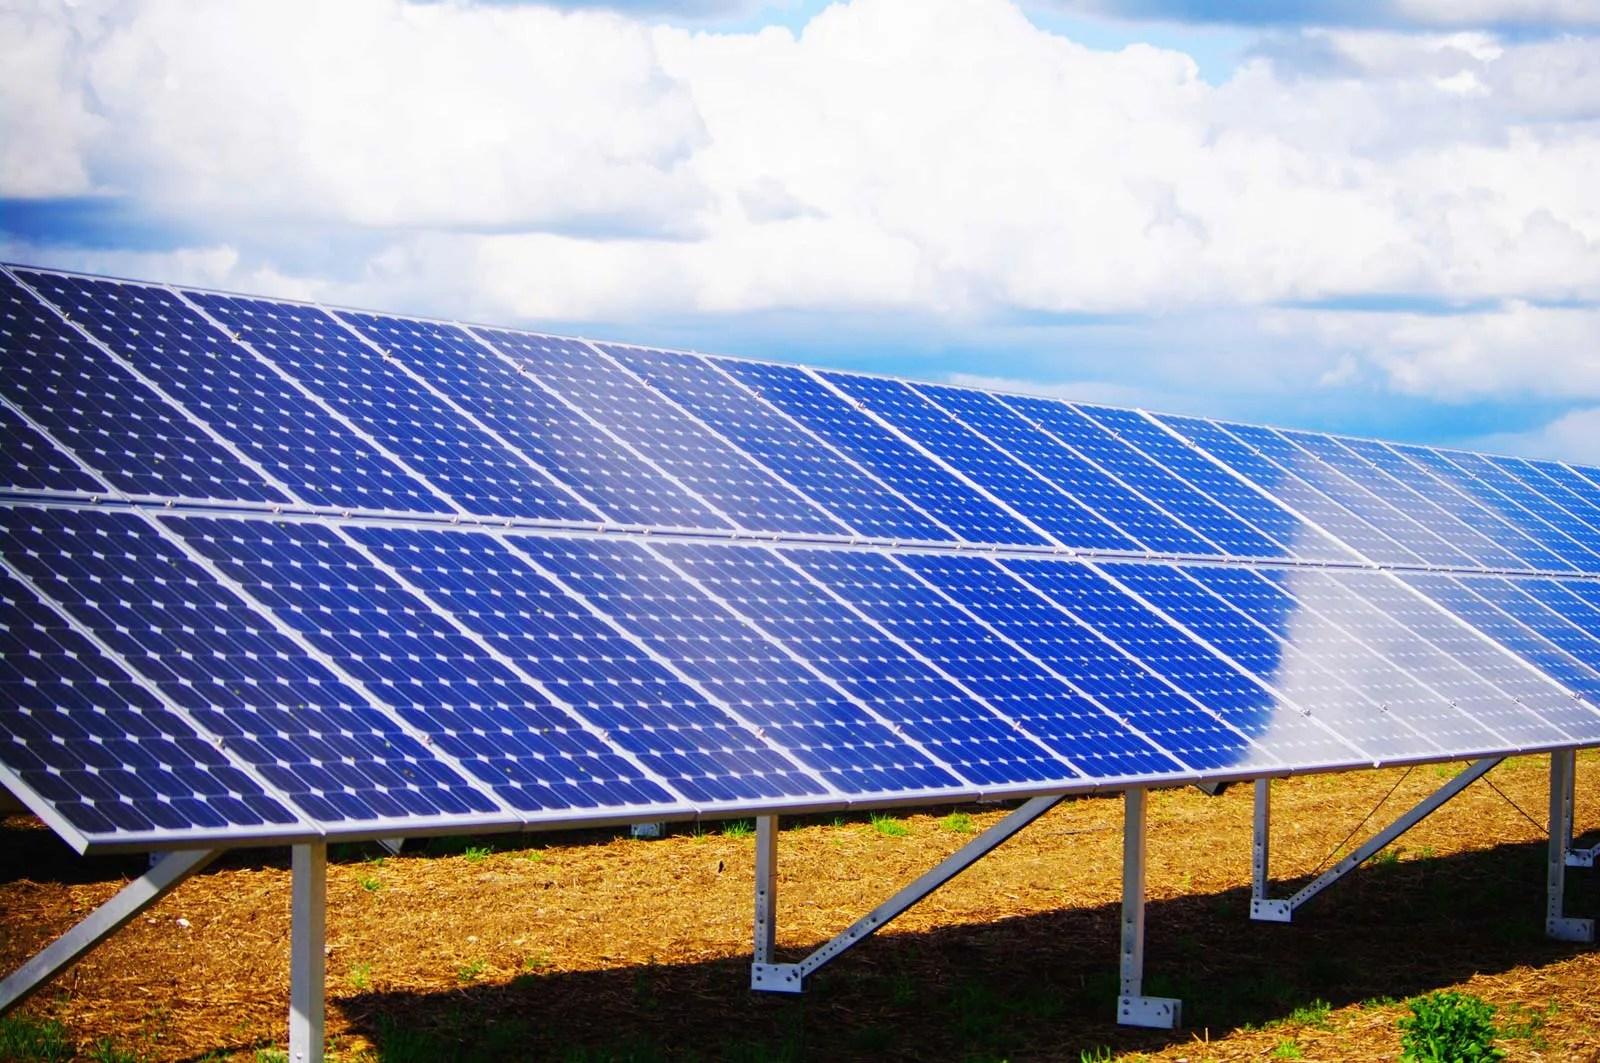 How Solar Power Systems Transform Sunlight Into Energy